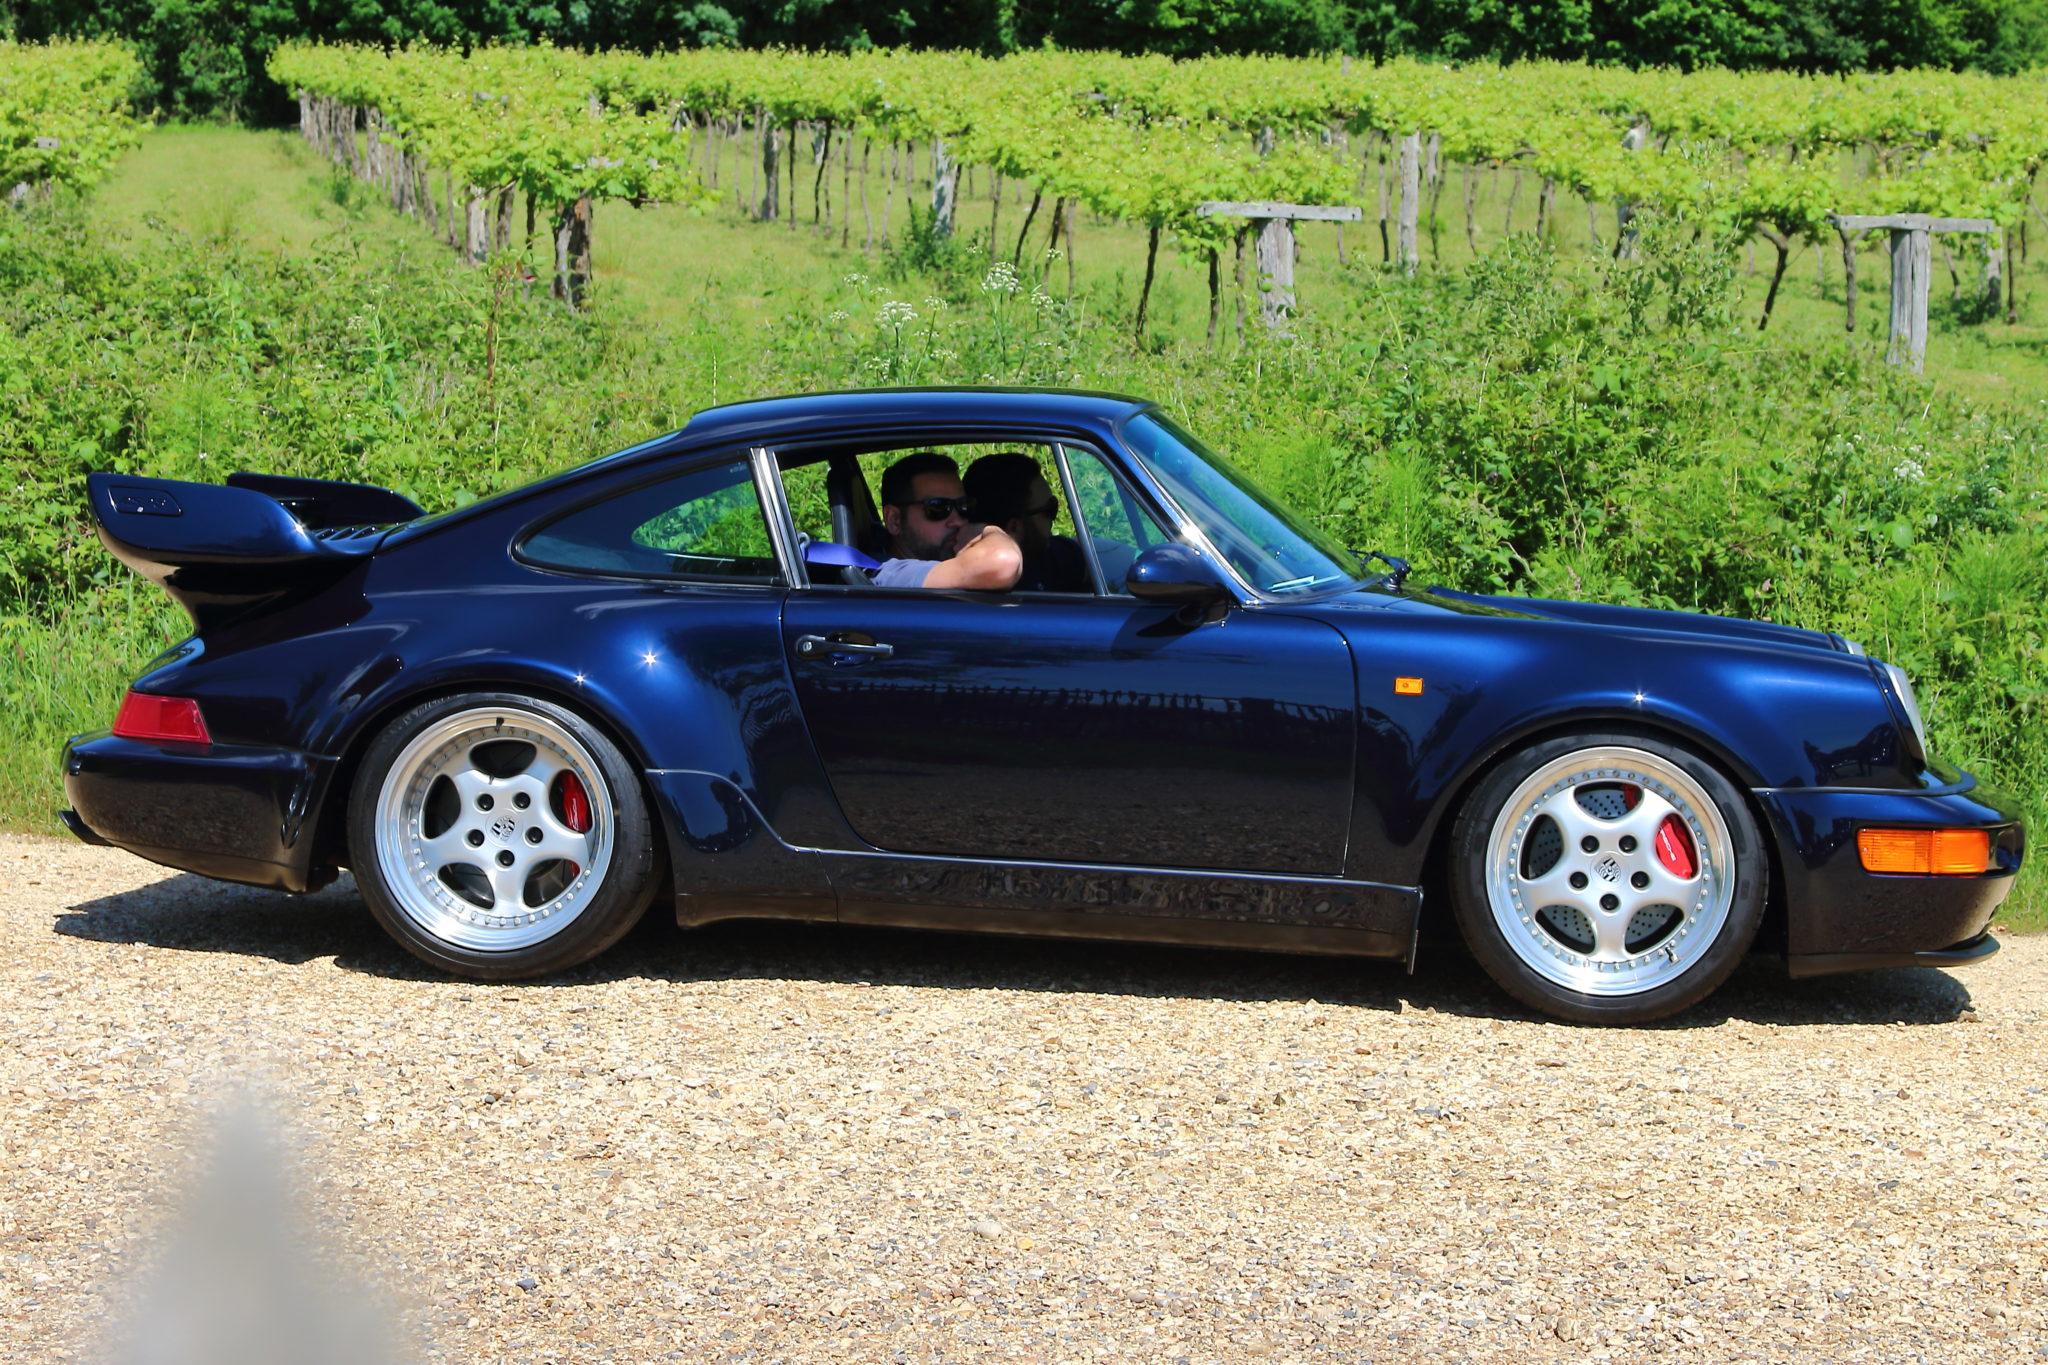 Beaulieu's Simply Porsche – A Pictorial